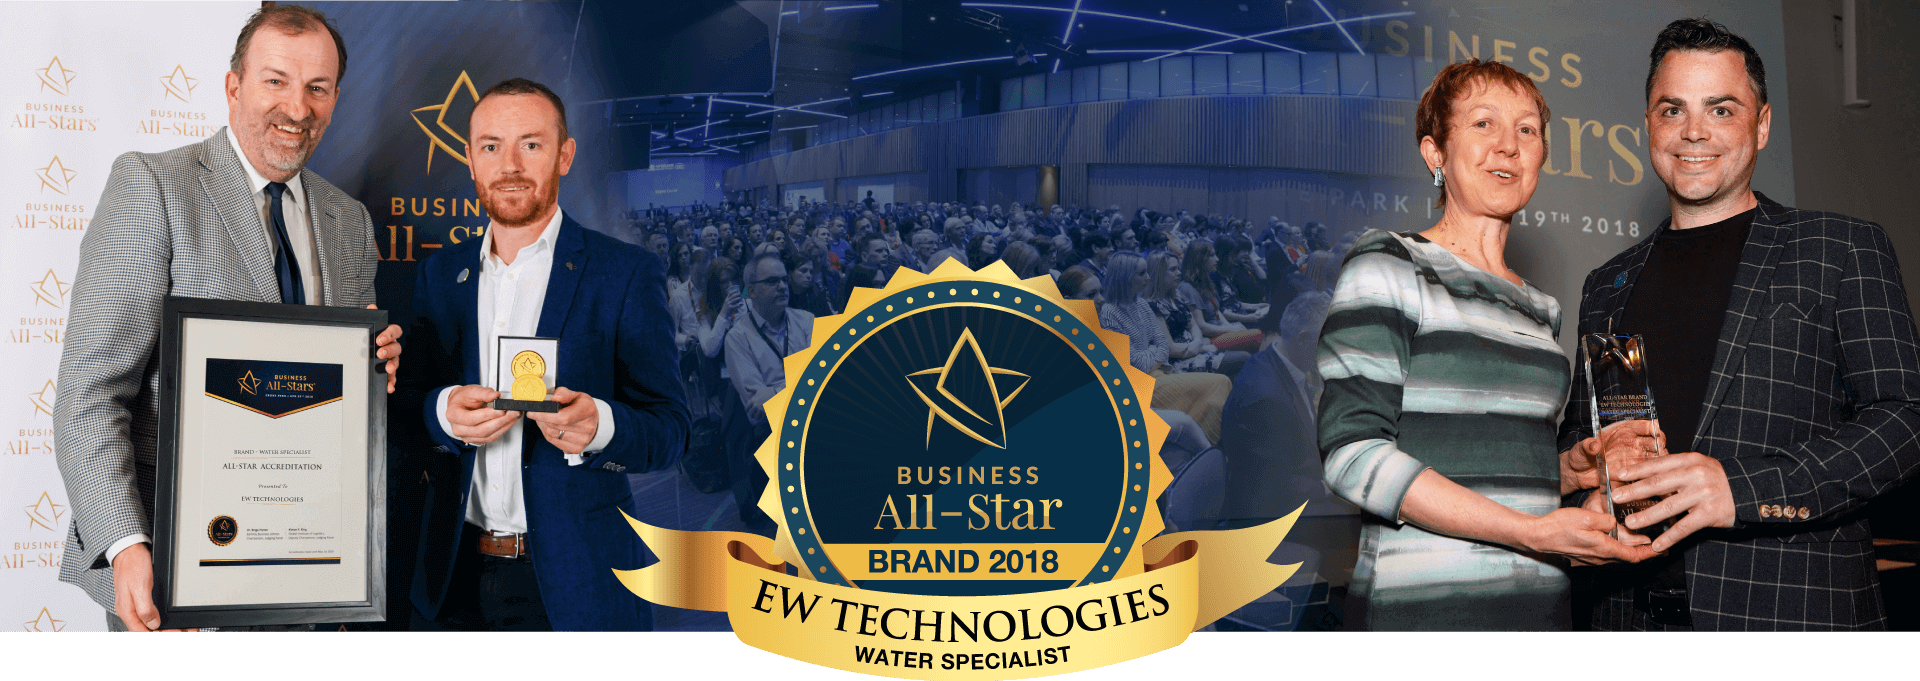 Business All - Stars Award, Croke Park Dublin